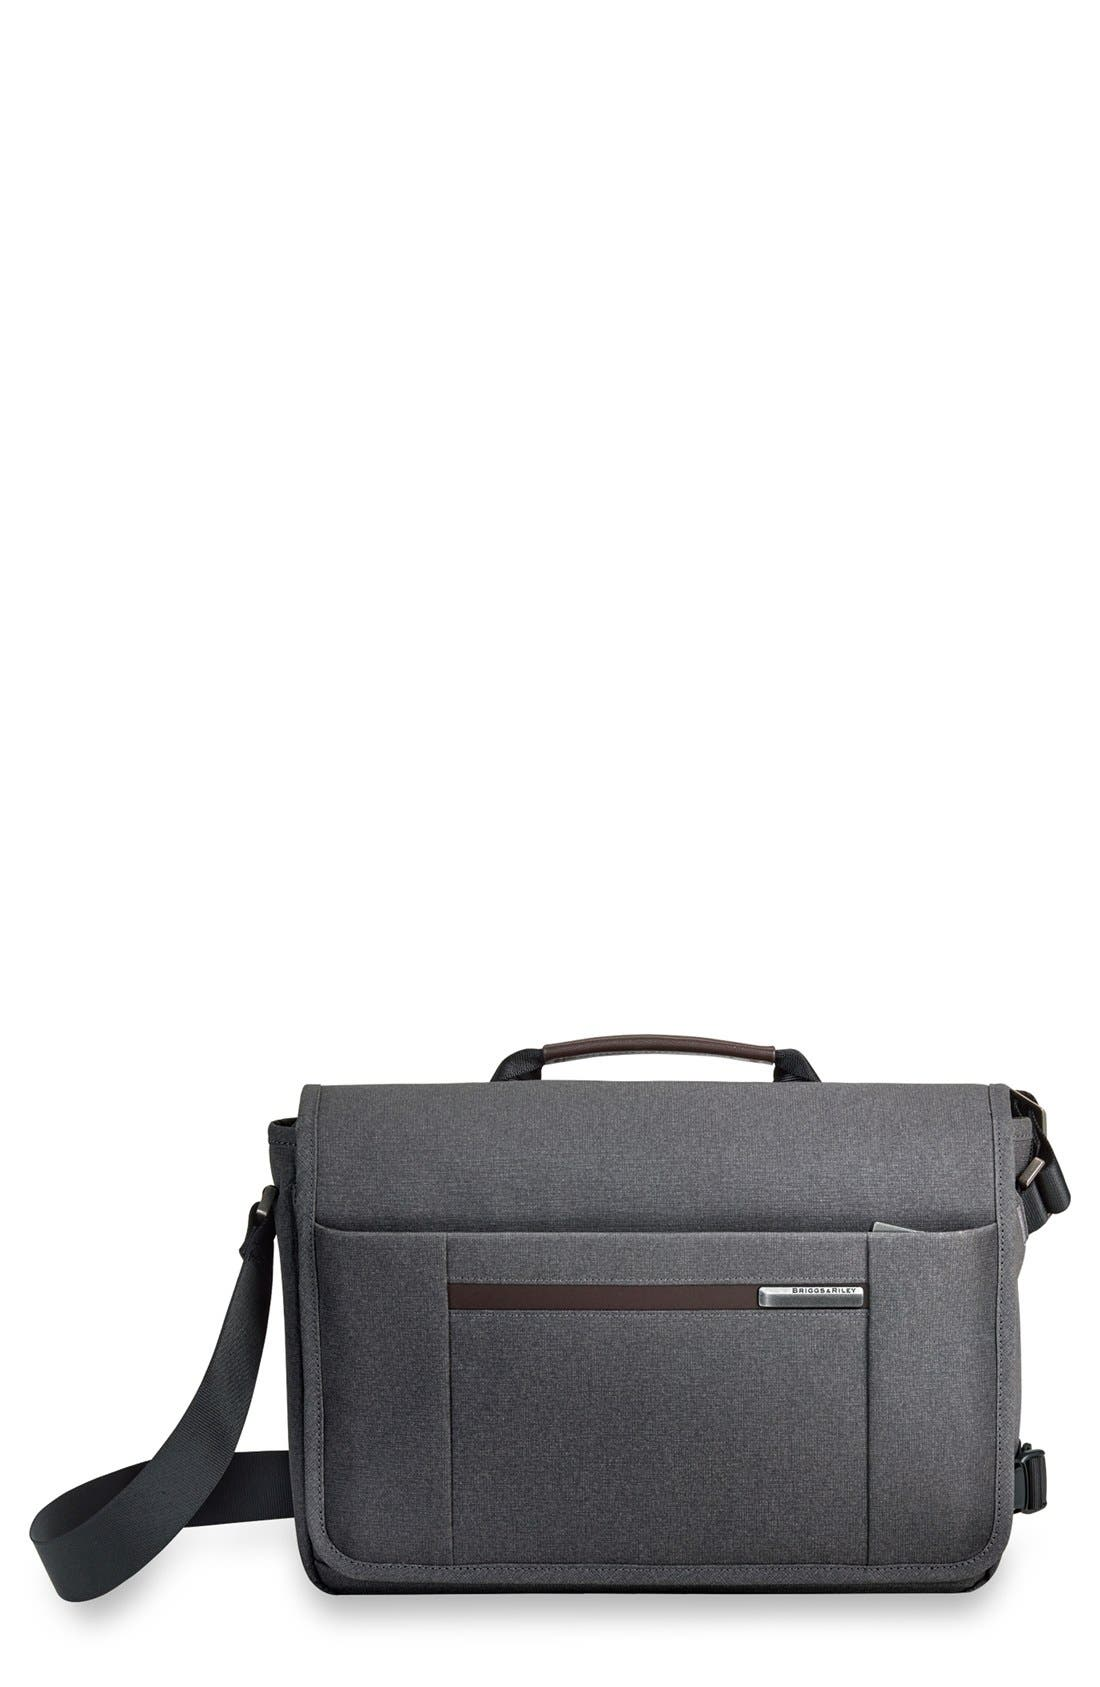 Main Image - Briggs & Riley 'Kinzie Street - Micro' Messenger Bag